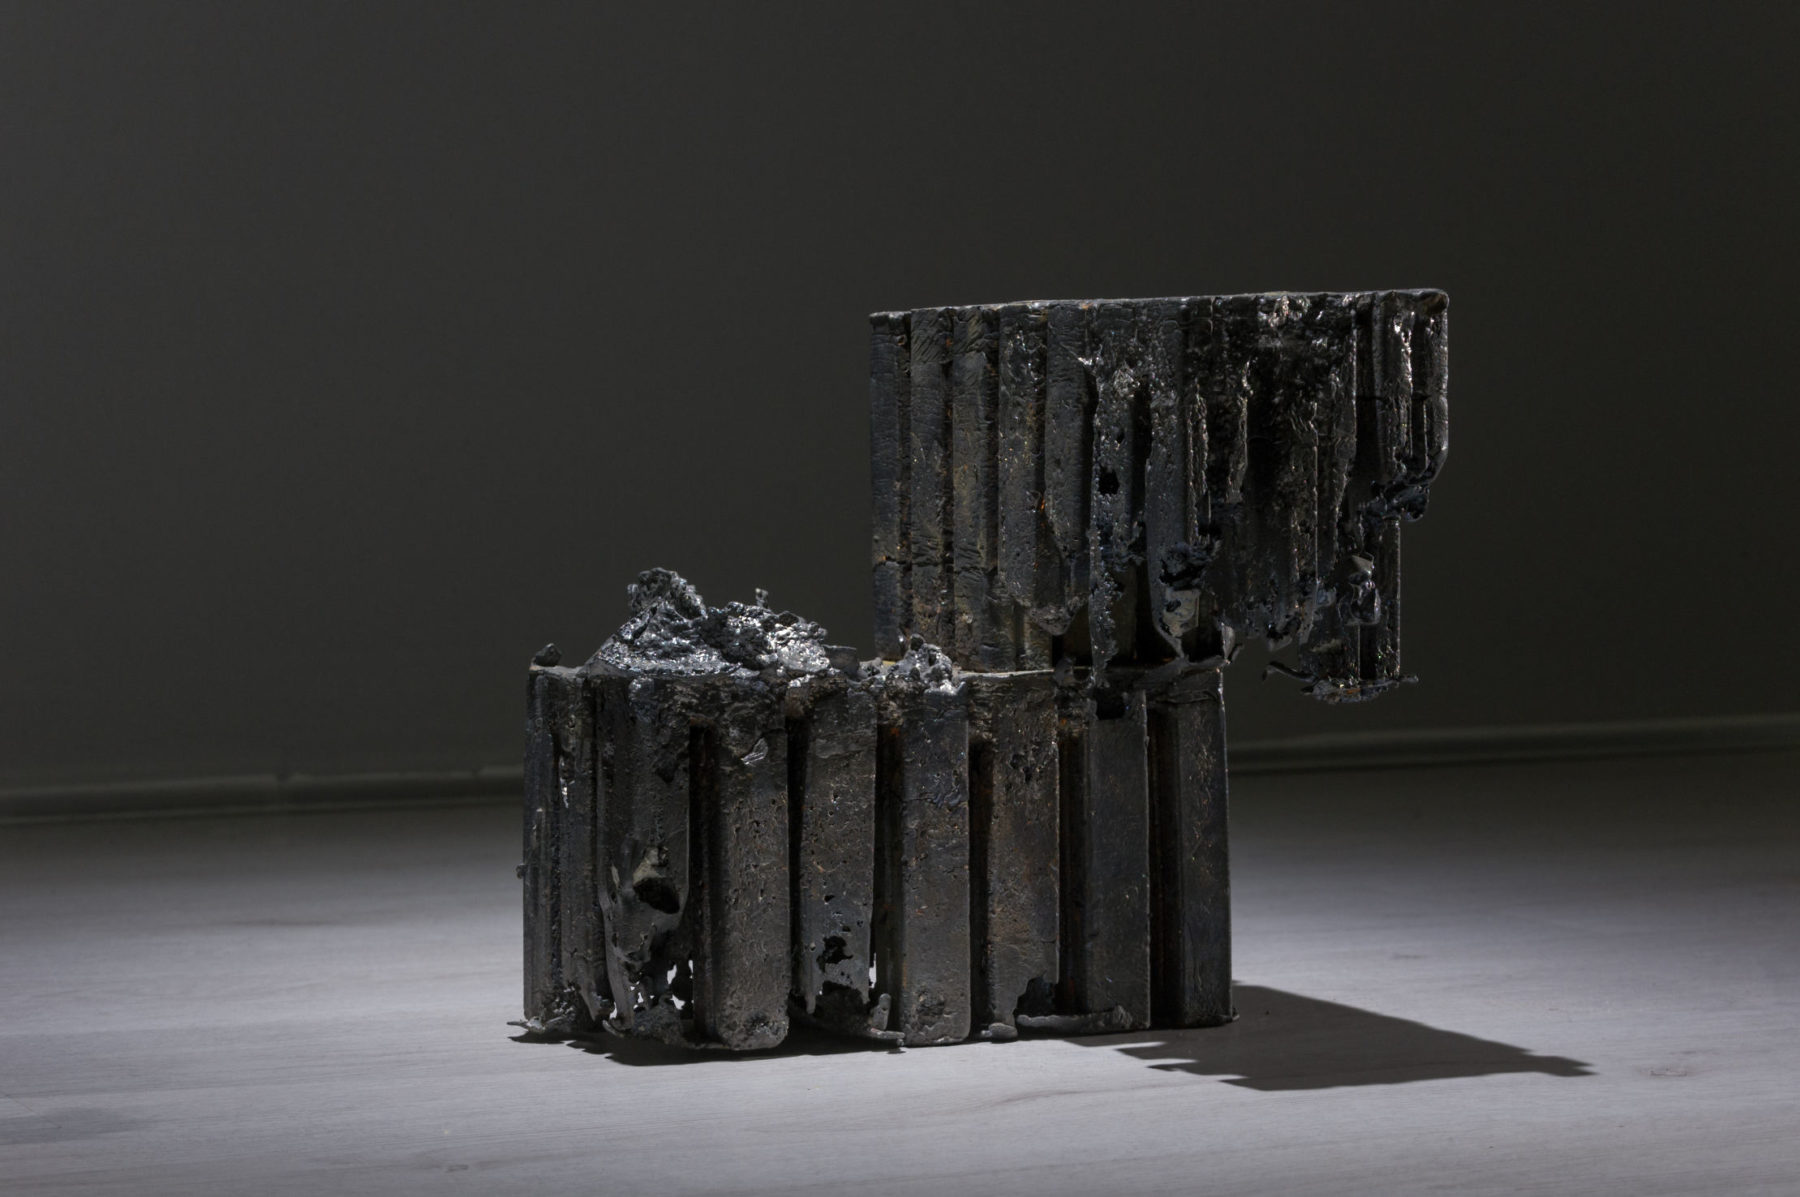 Marco La Rosa, Untitled (Apoteosi), 24x24x24cm, piombo, 2016